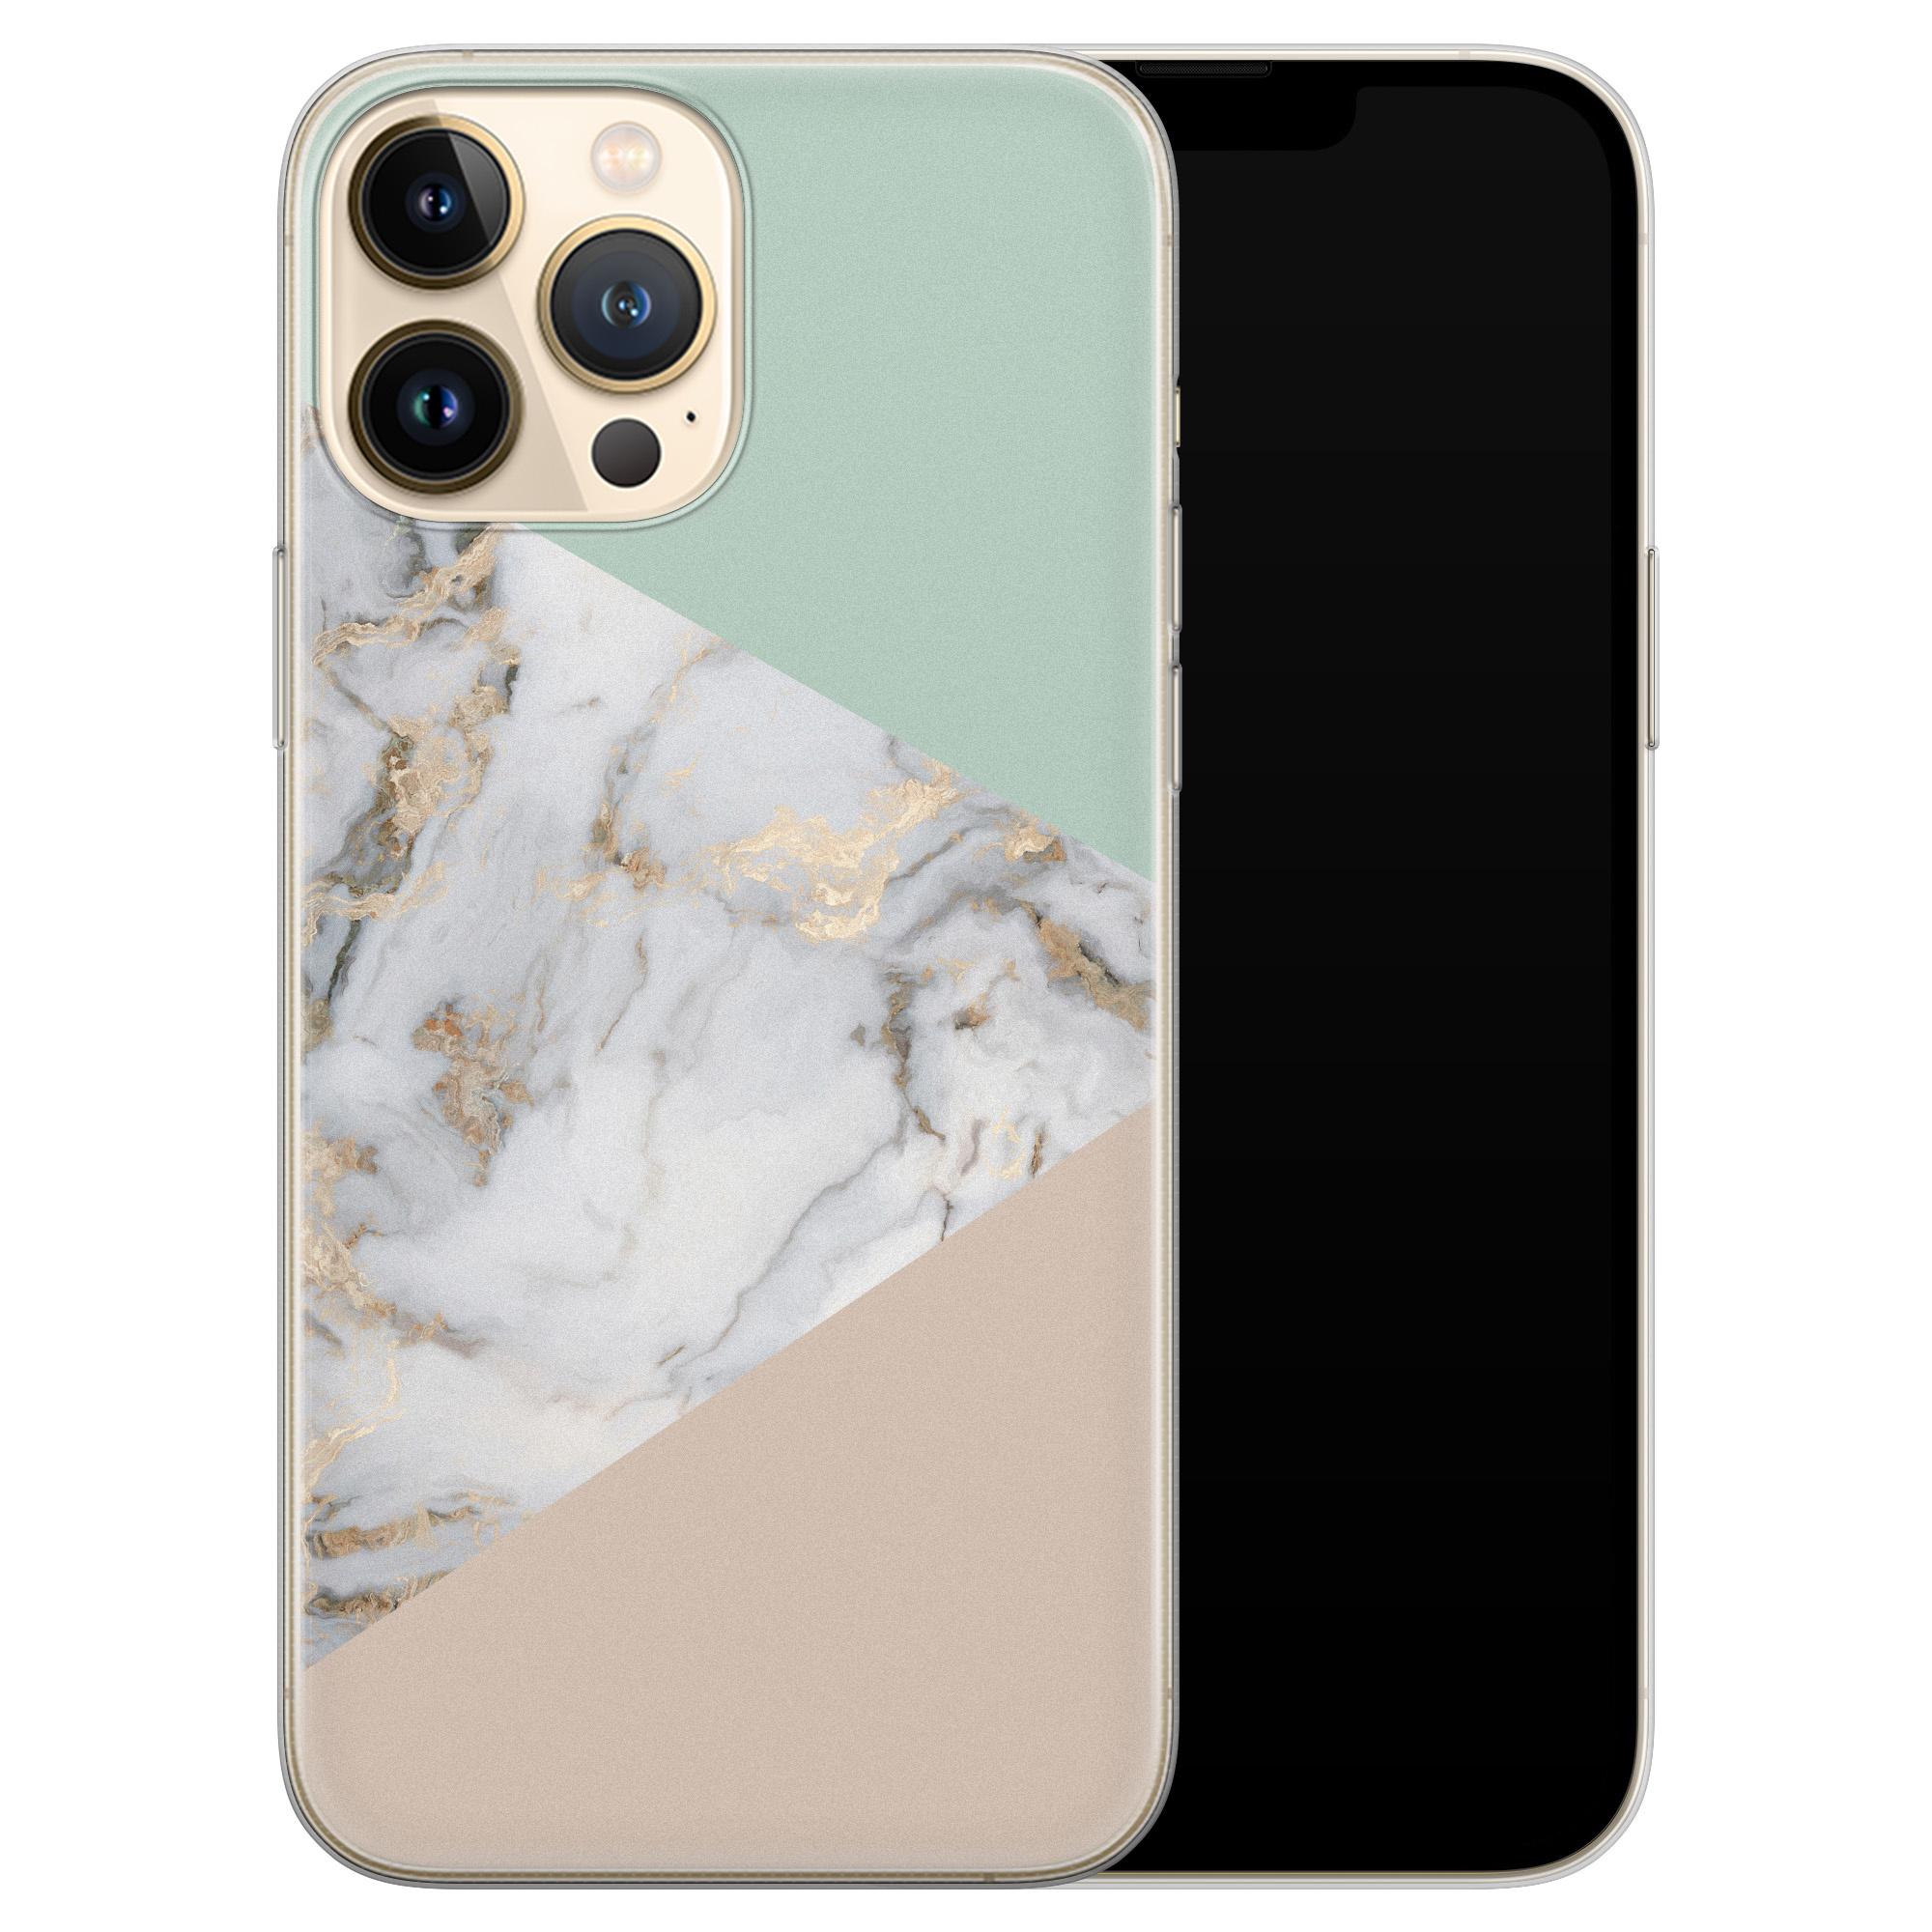 Leuke Telefoonhoesjes iPhone 13 Pro Max siliconen hoesje - Marmer pastel mix